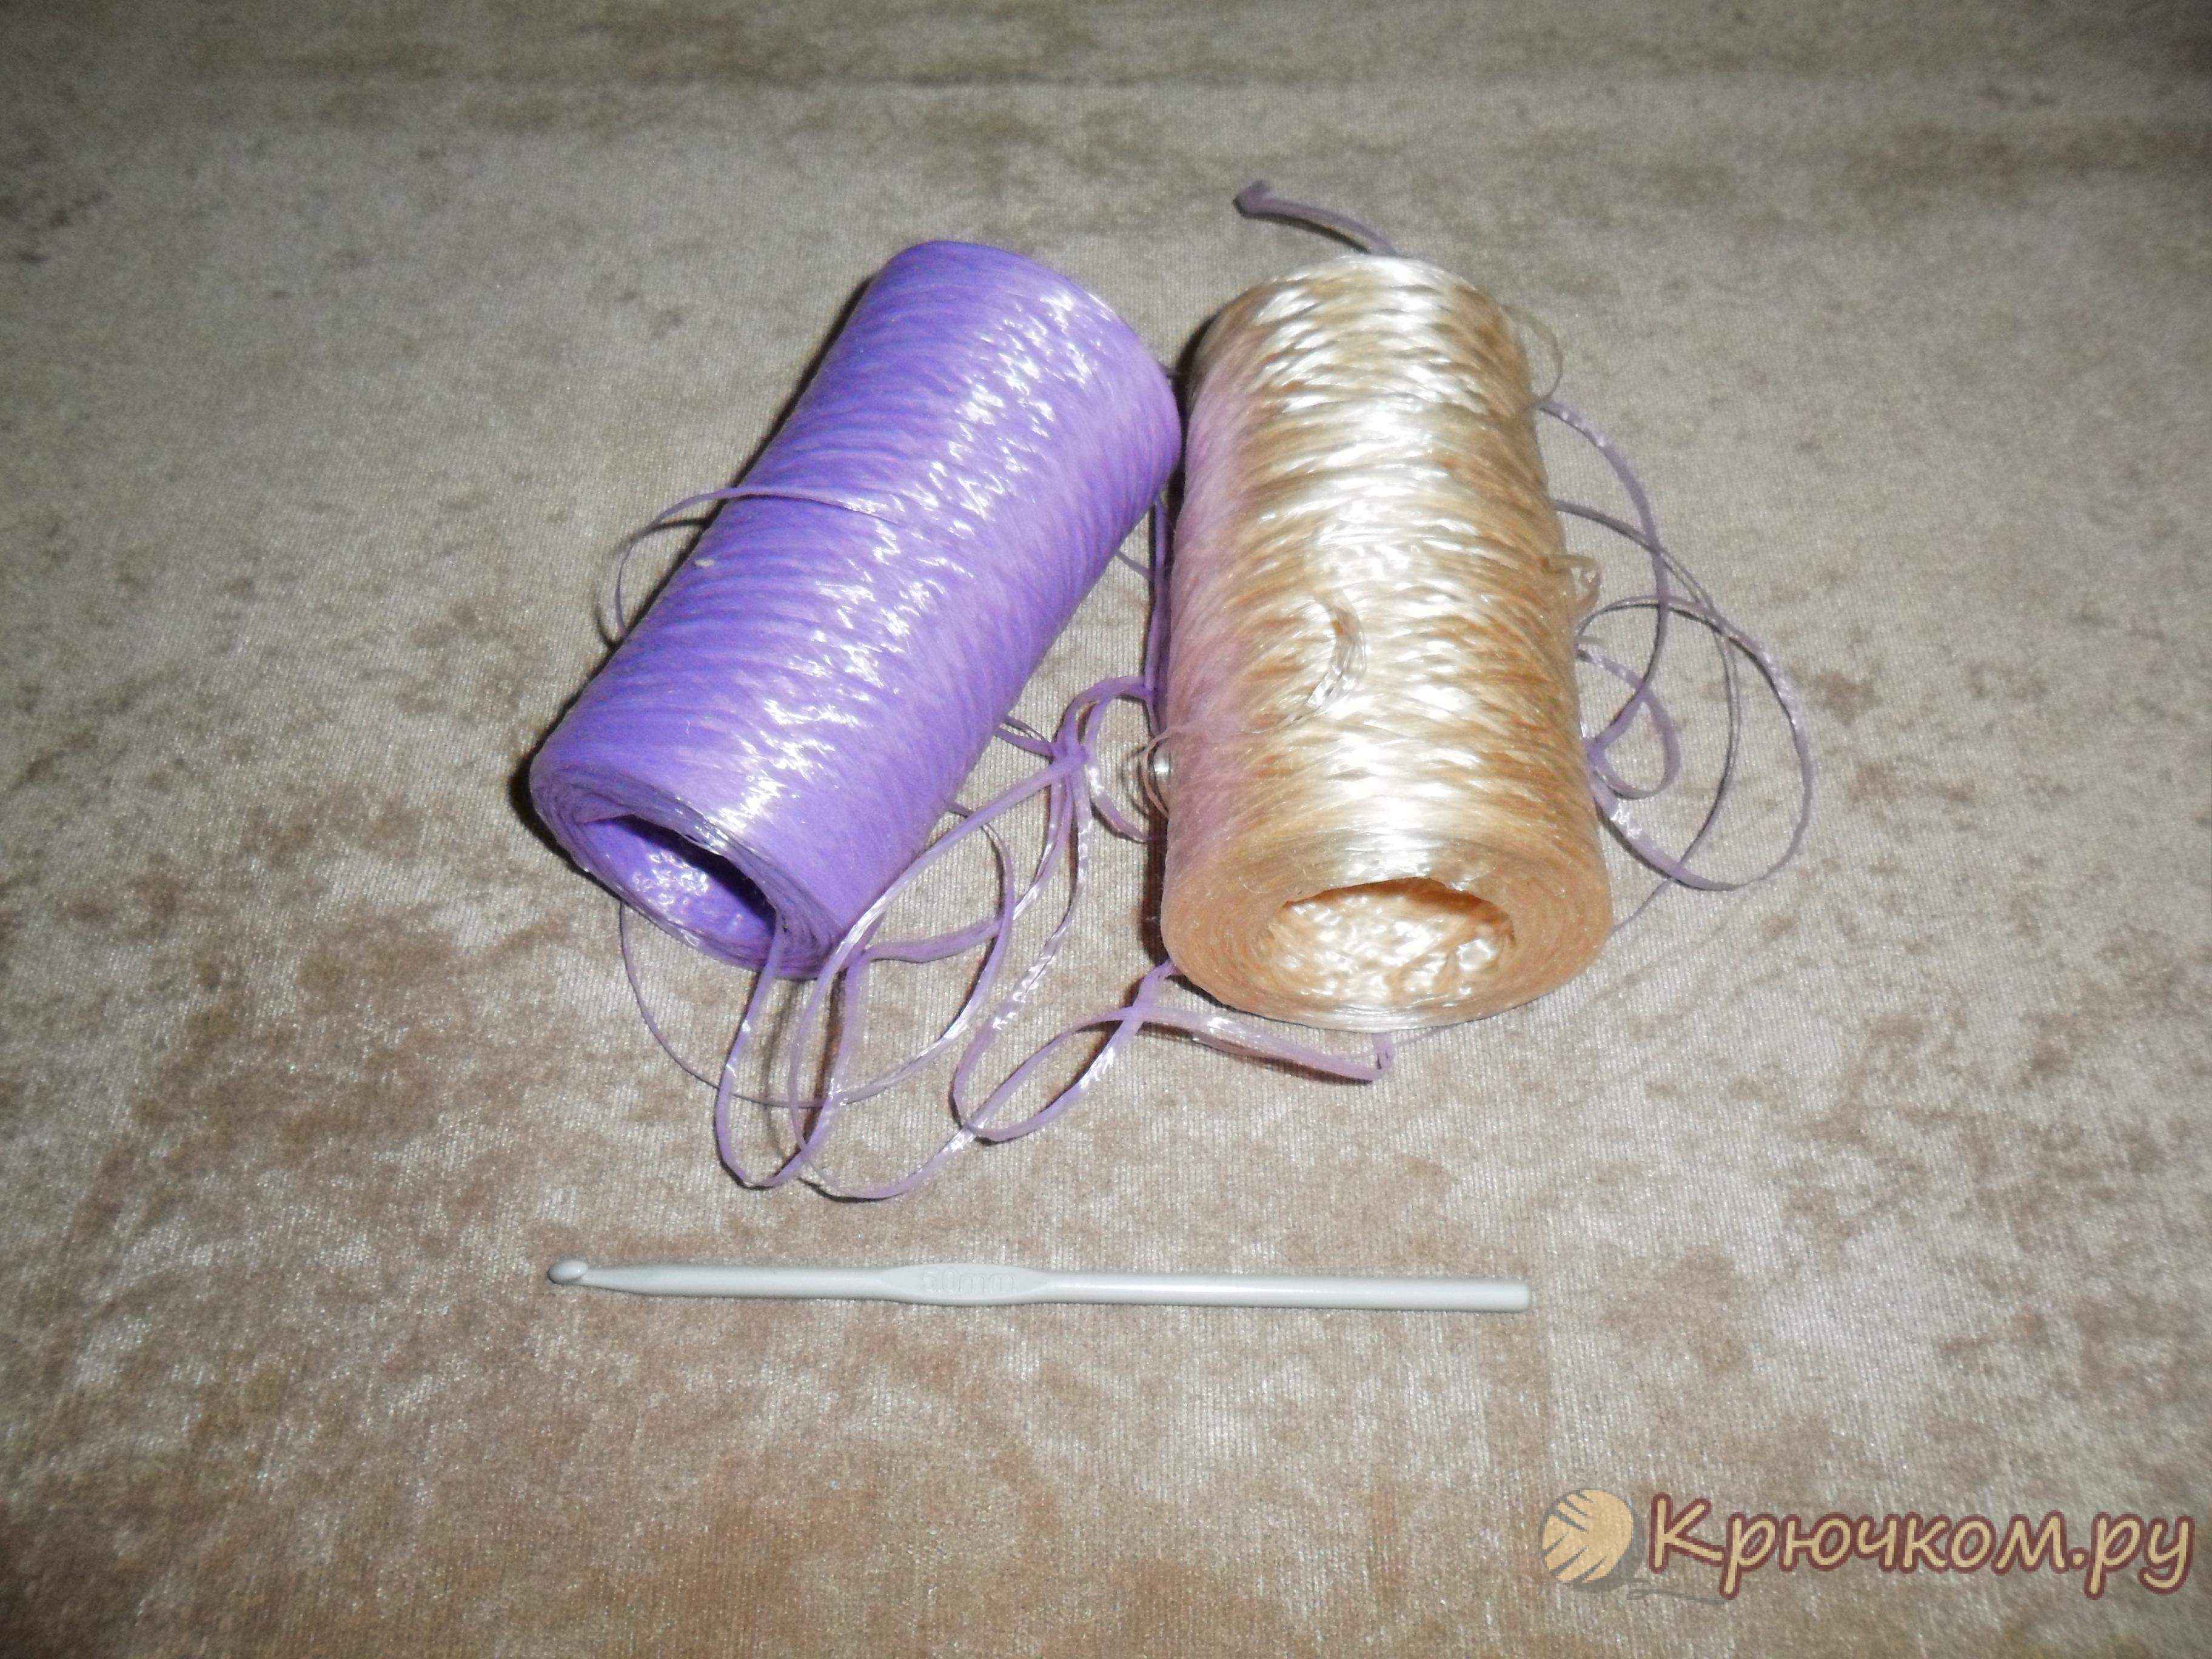 Вязание крючком мочалки (фото мастер-класс)